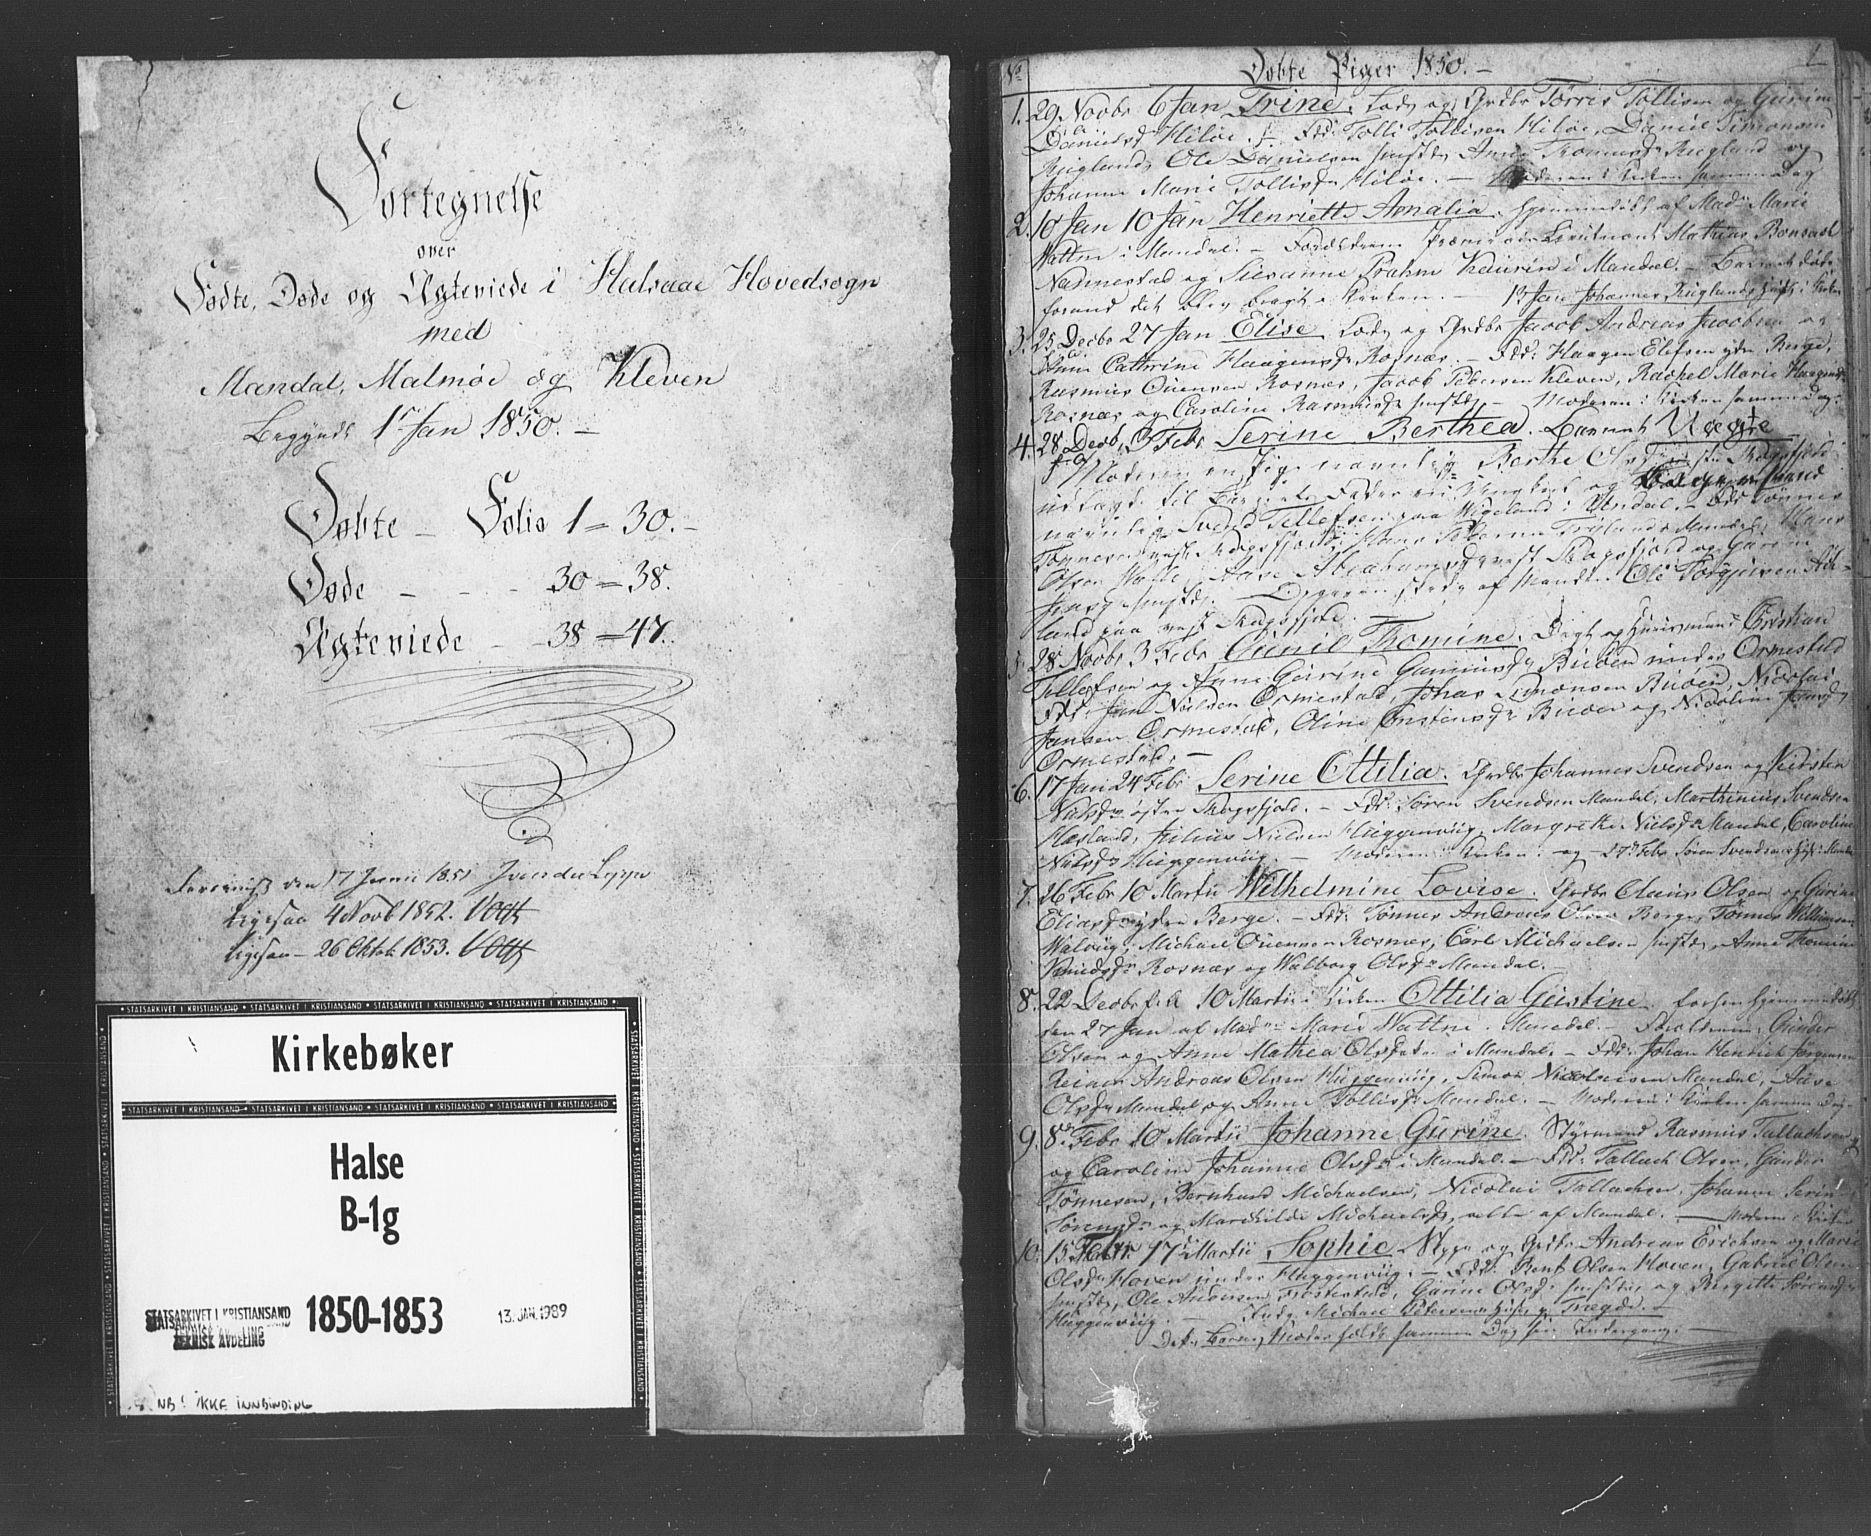 SAK, Mandal sokneprestkontor, F/Fb/Fba/L0007: Klokkerbok nr. B 1G, 1850-1853, s. 1